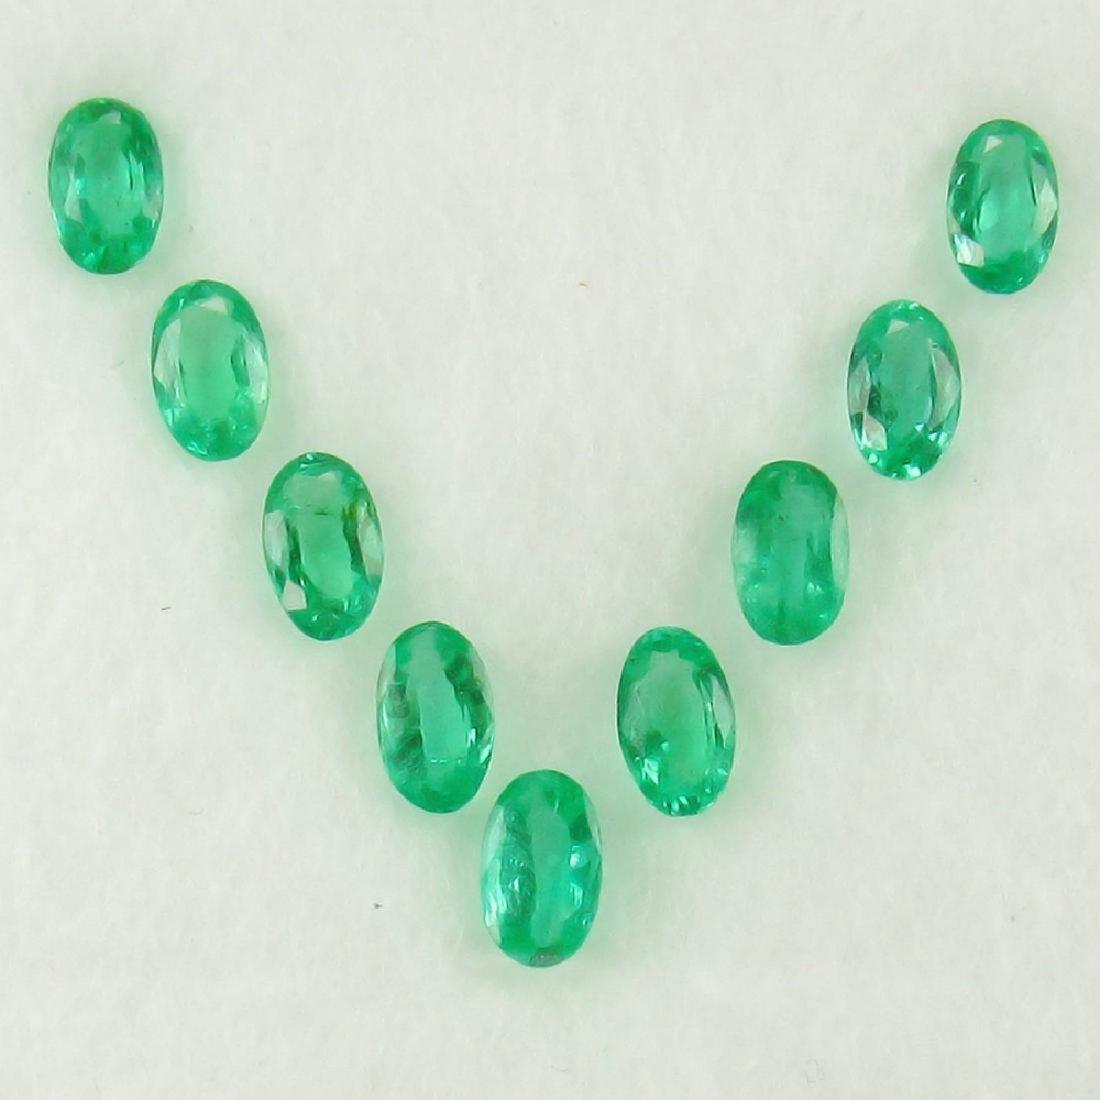 1.92 Carat Loose Zambian Emerald Necklace Set